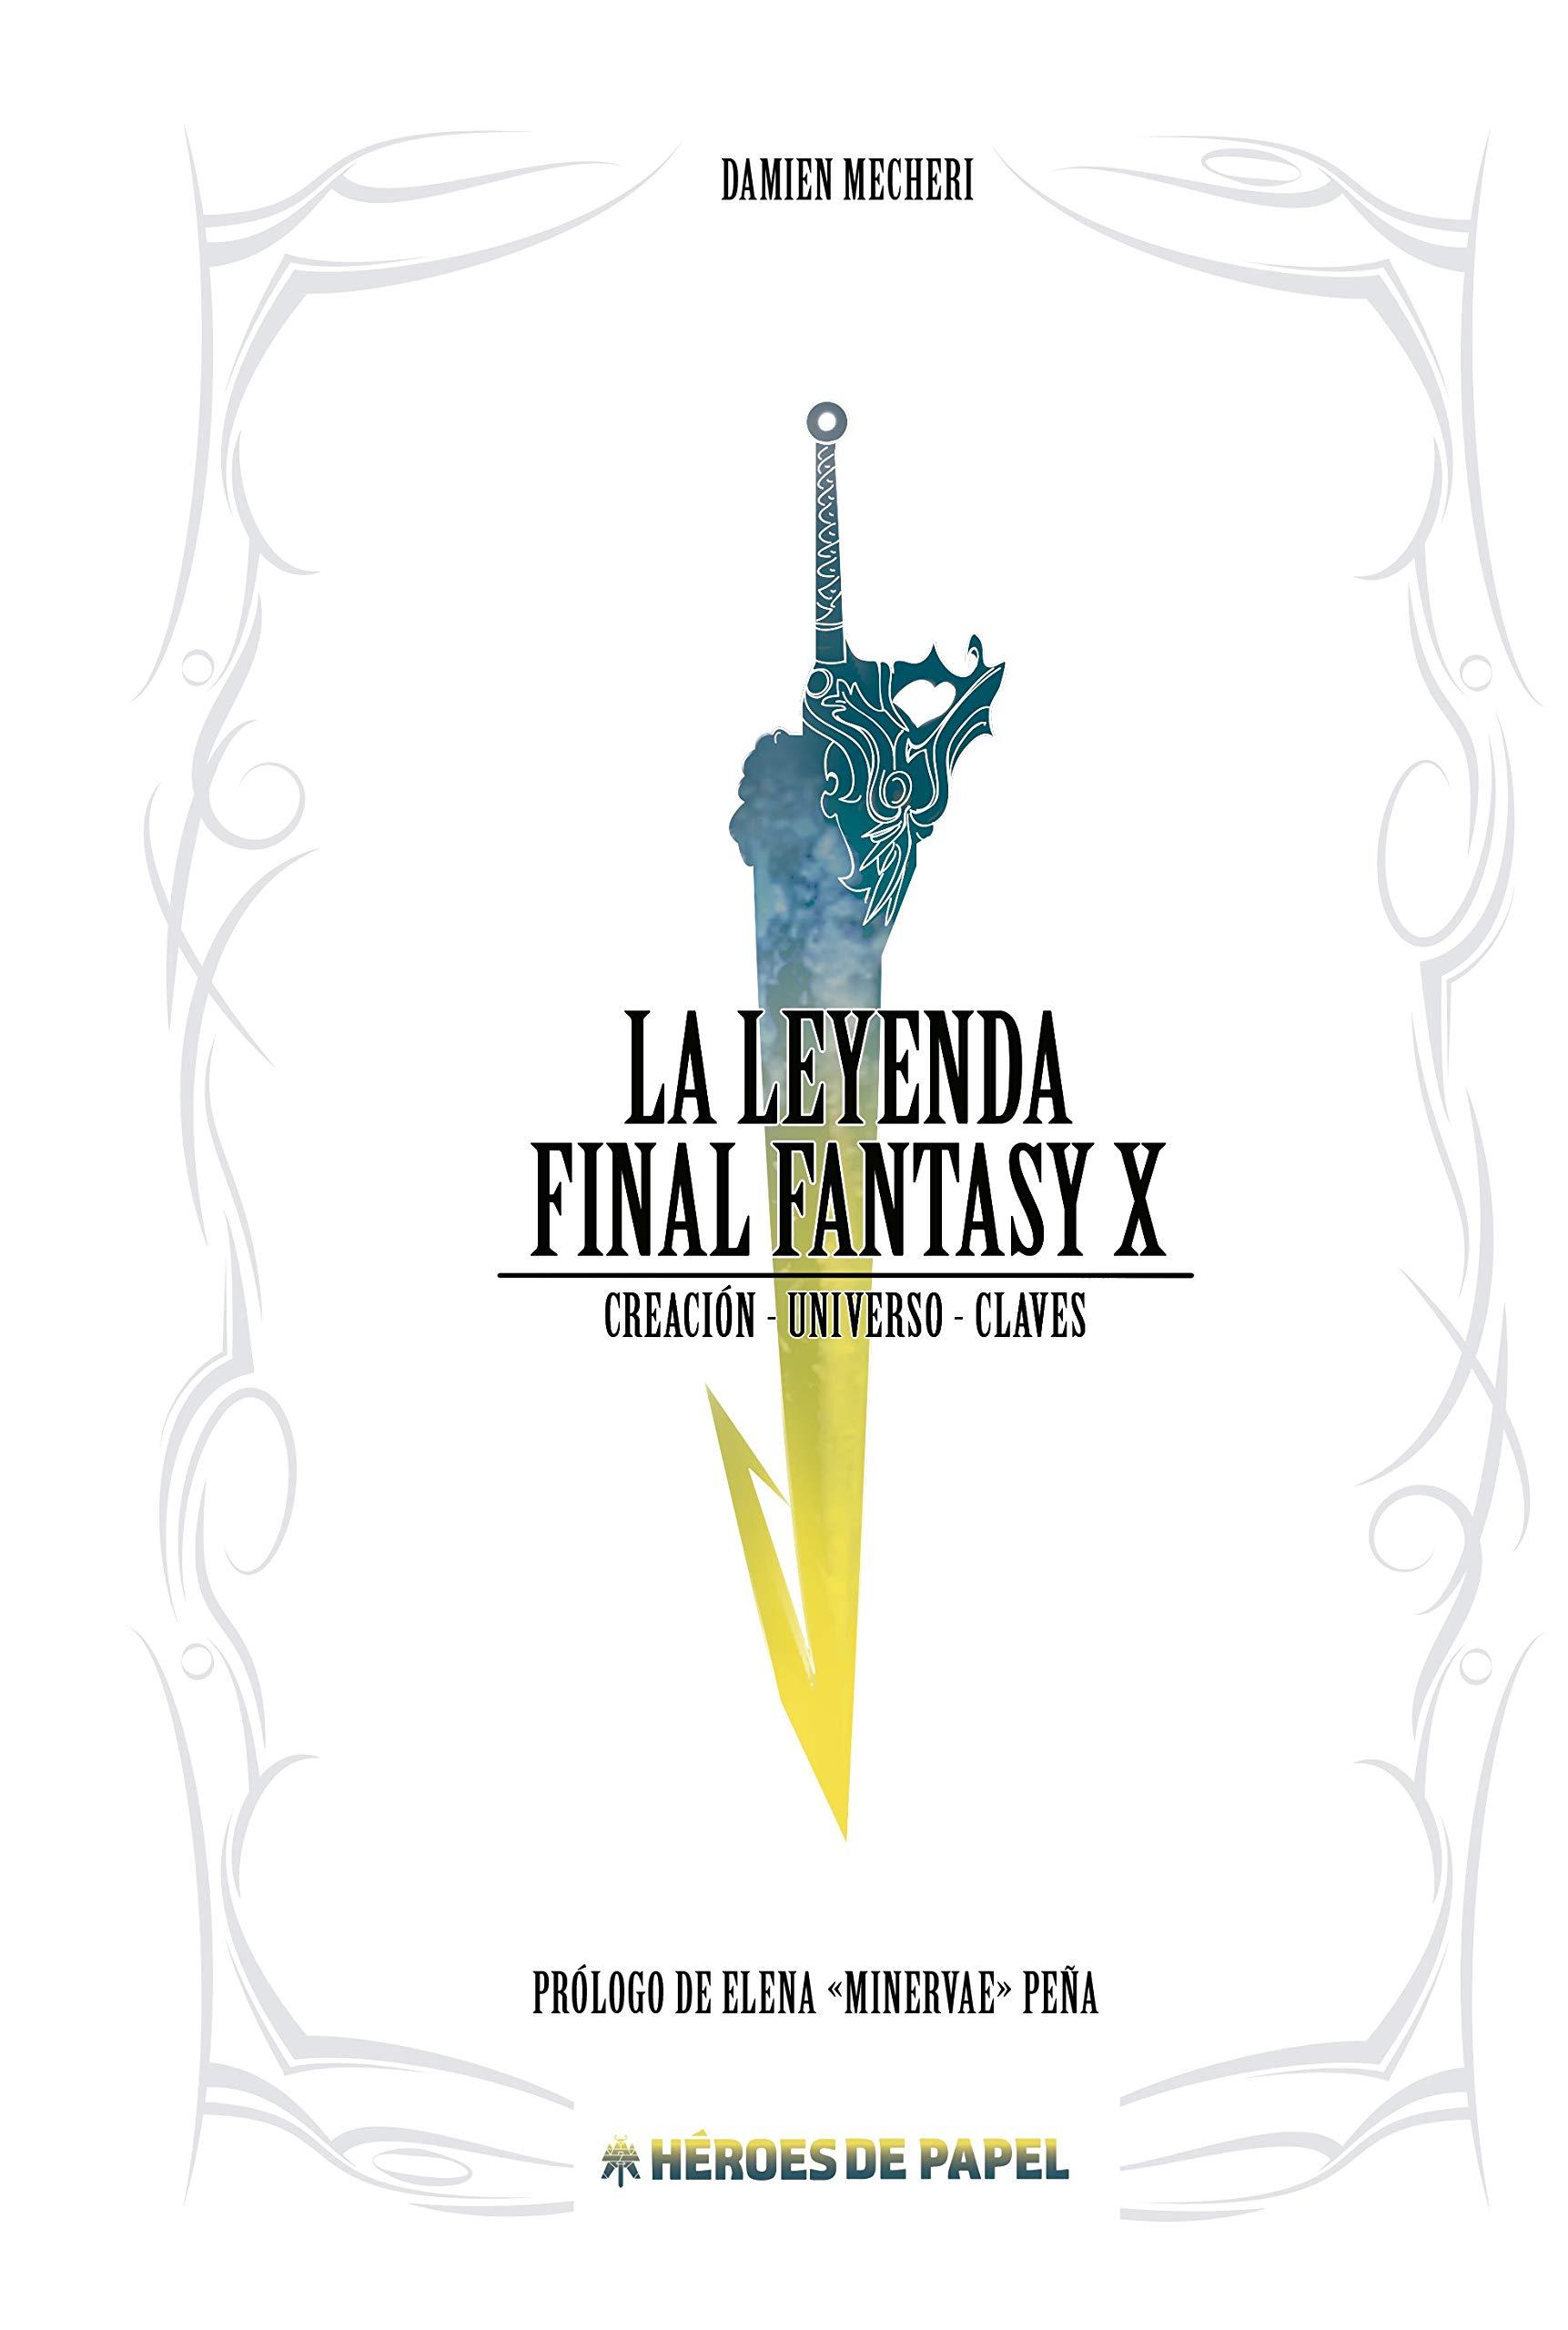 Leyenda Final Fantasy X La Damien Mecheri Sin Segundo